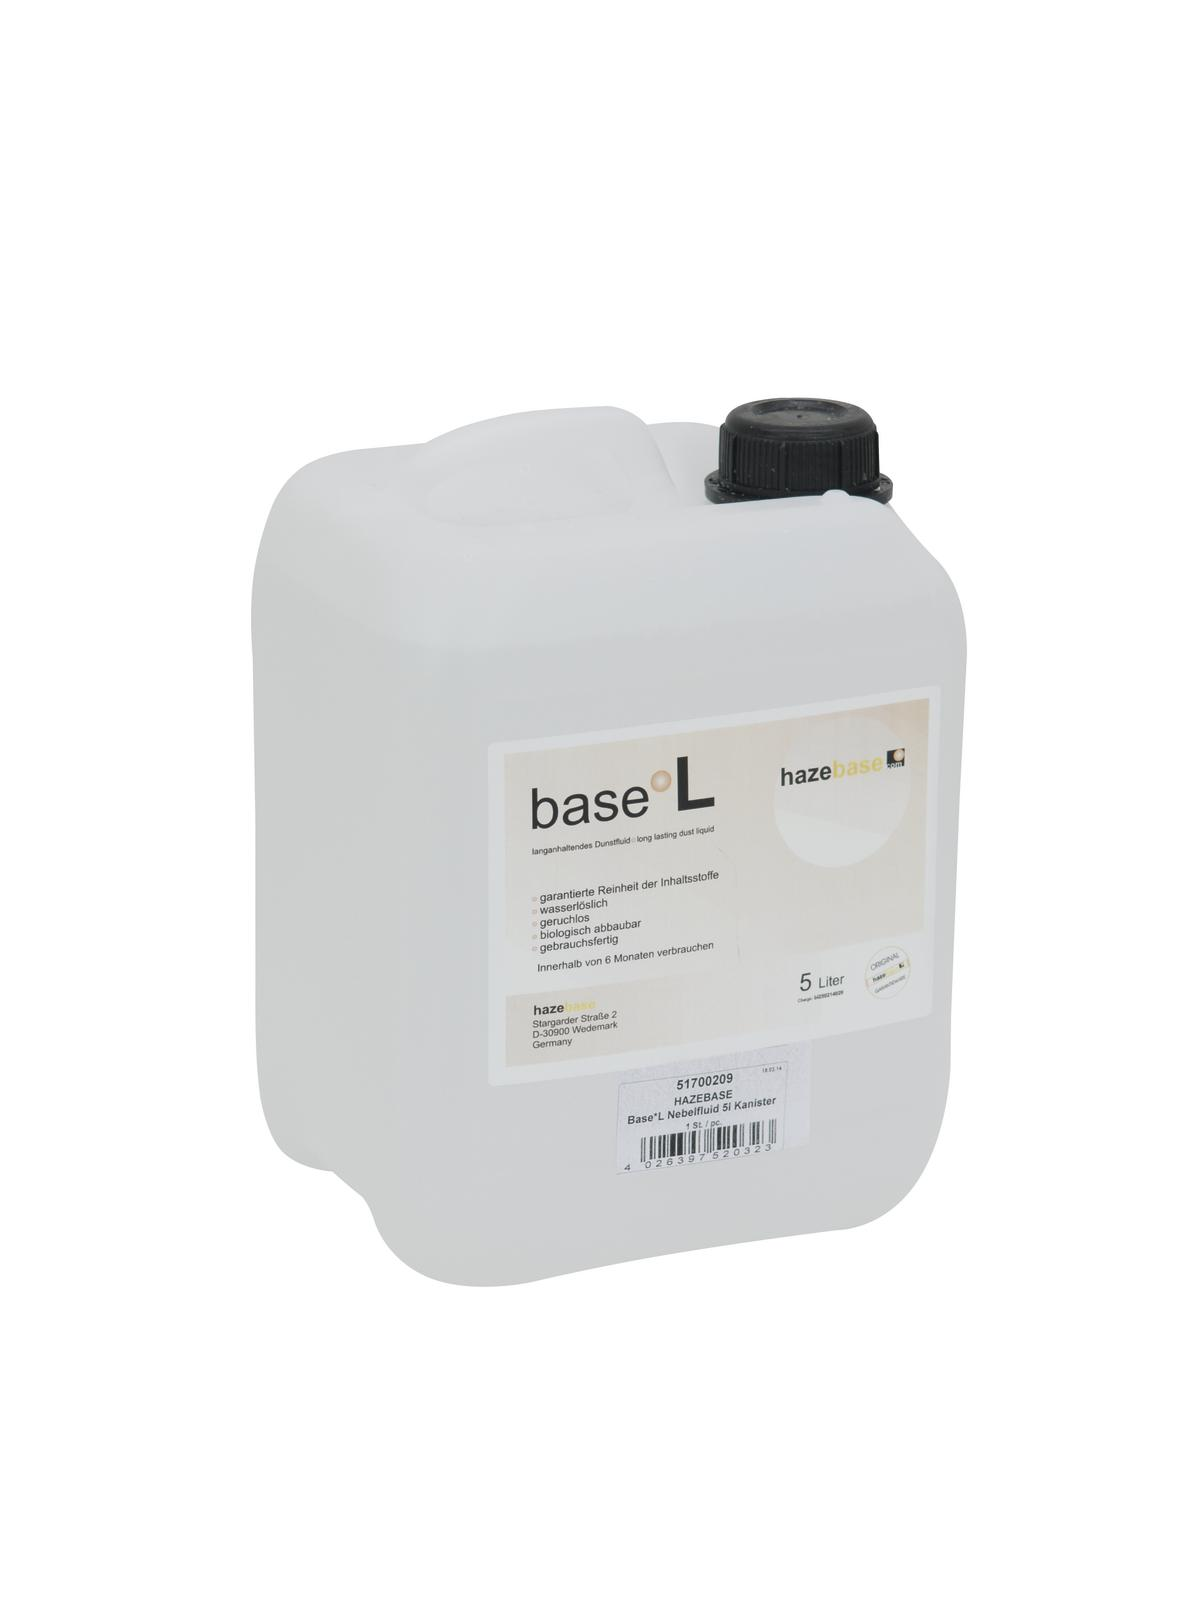 HAZEBASE Base*L Nebelfluid 25l Kanister